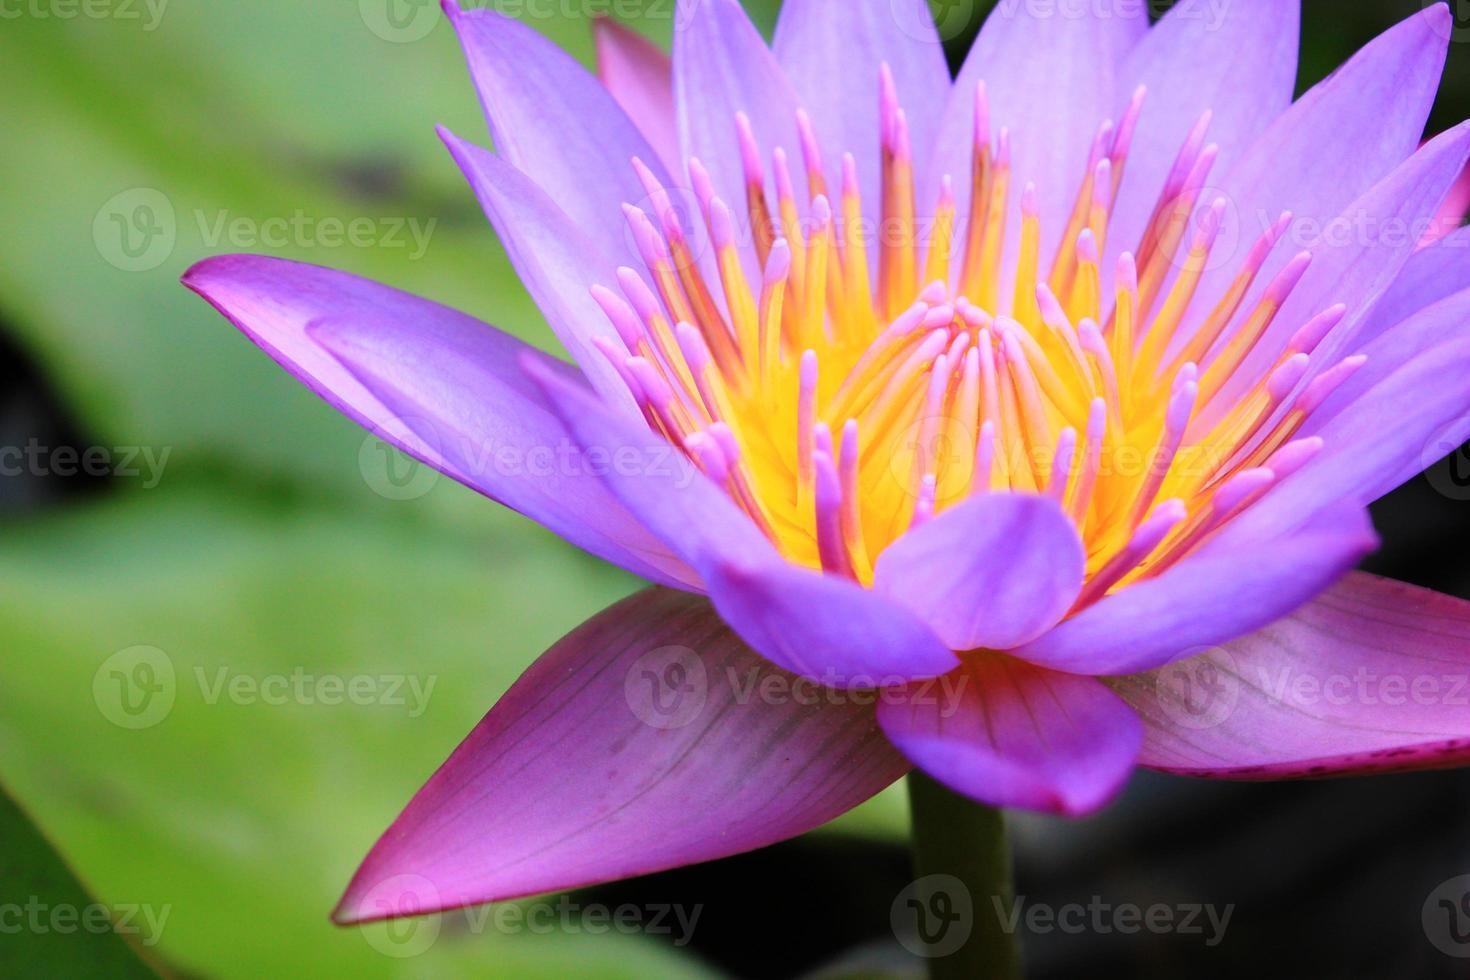 schöne Lotusblume foto